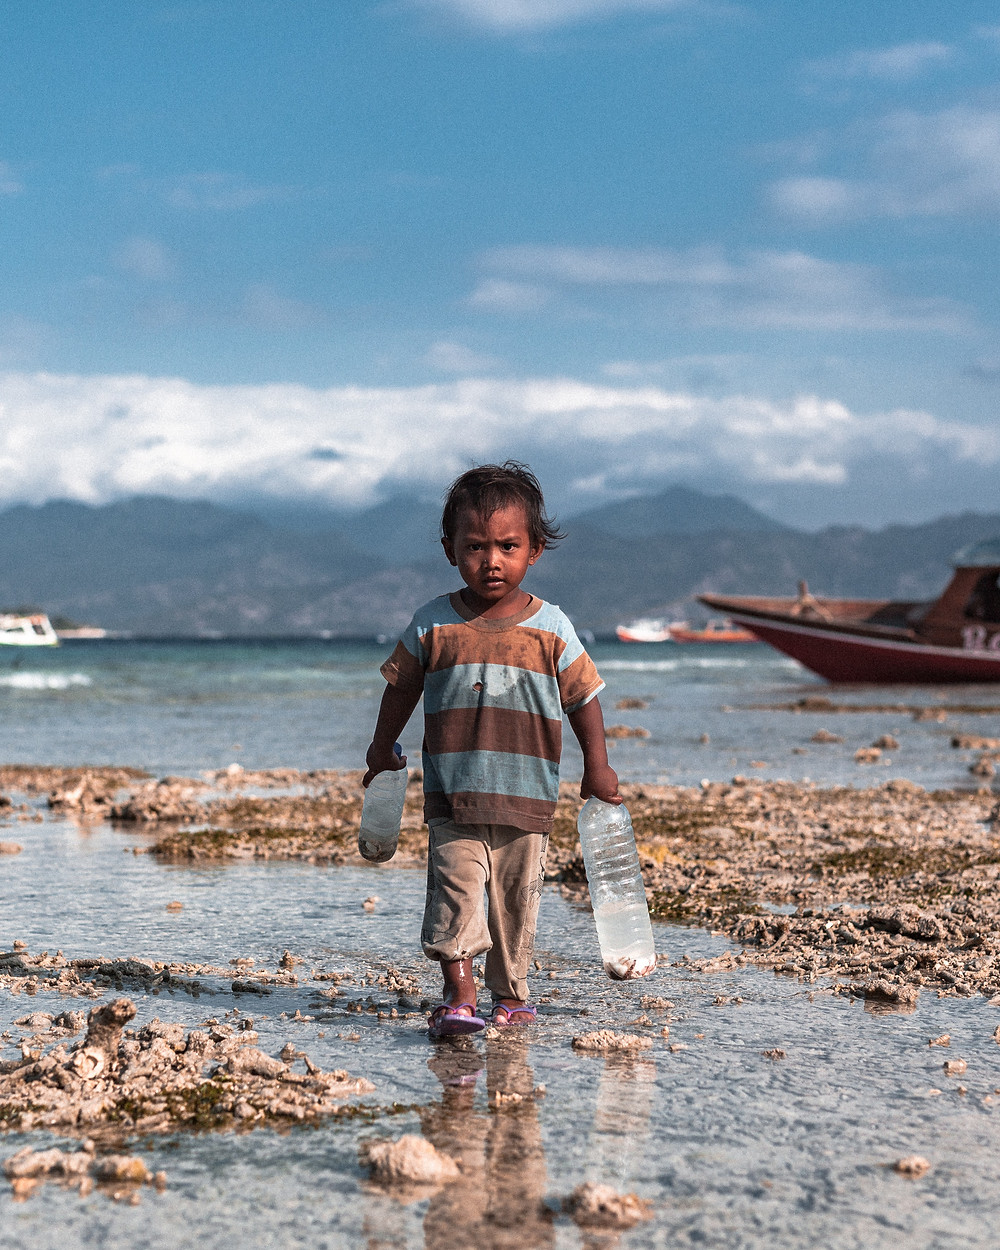 Seorang anak kecil di pantai yang sedang memegang dua botol besar (yang kemungkinan besar adalah sampah)